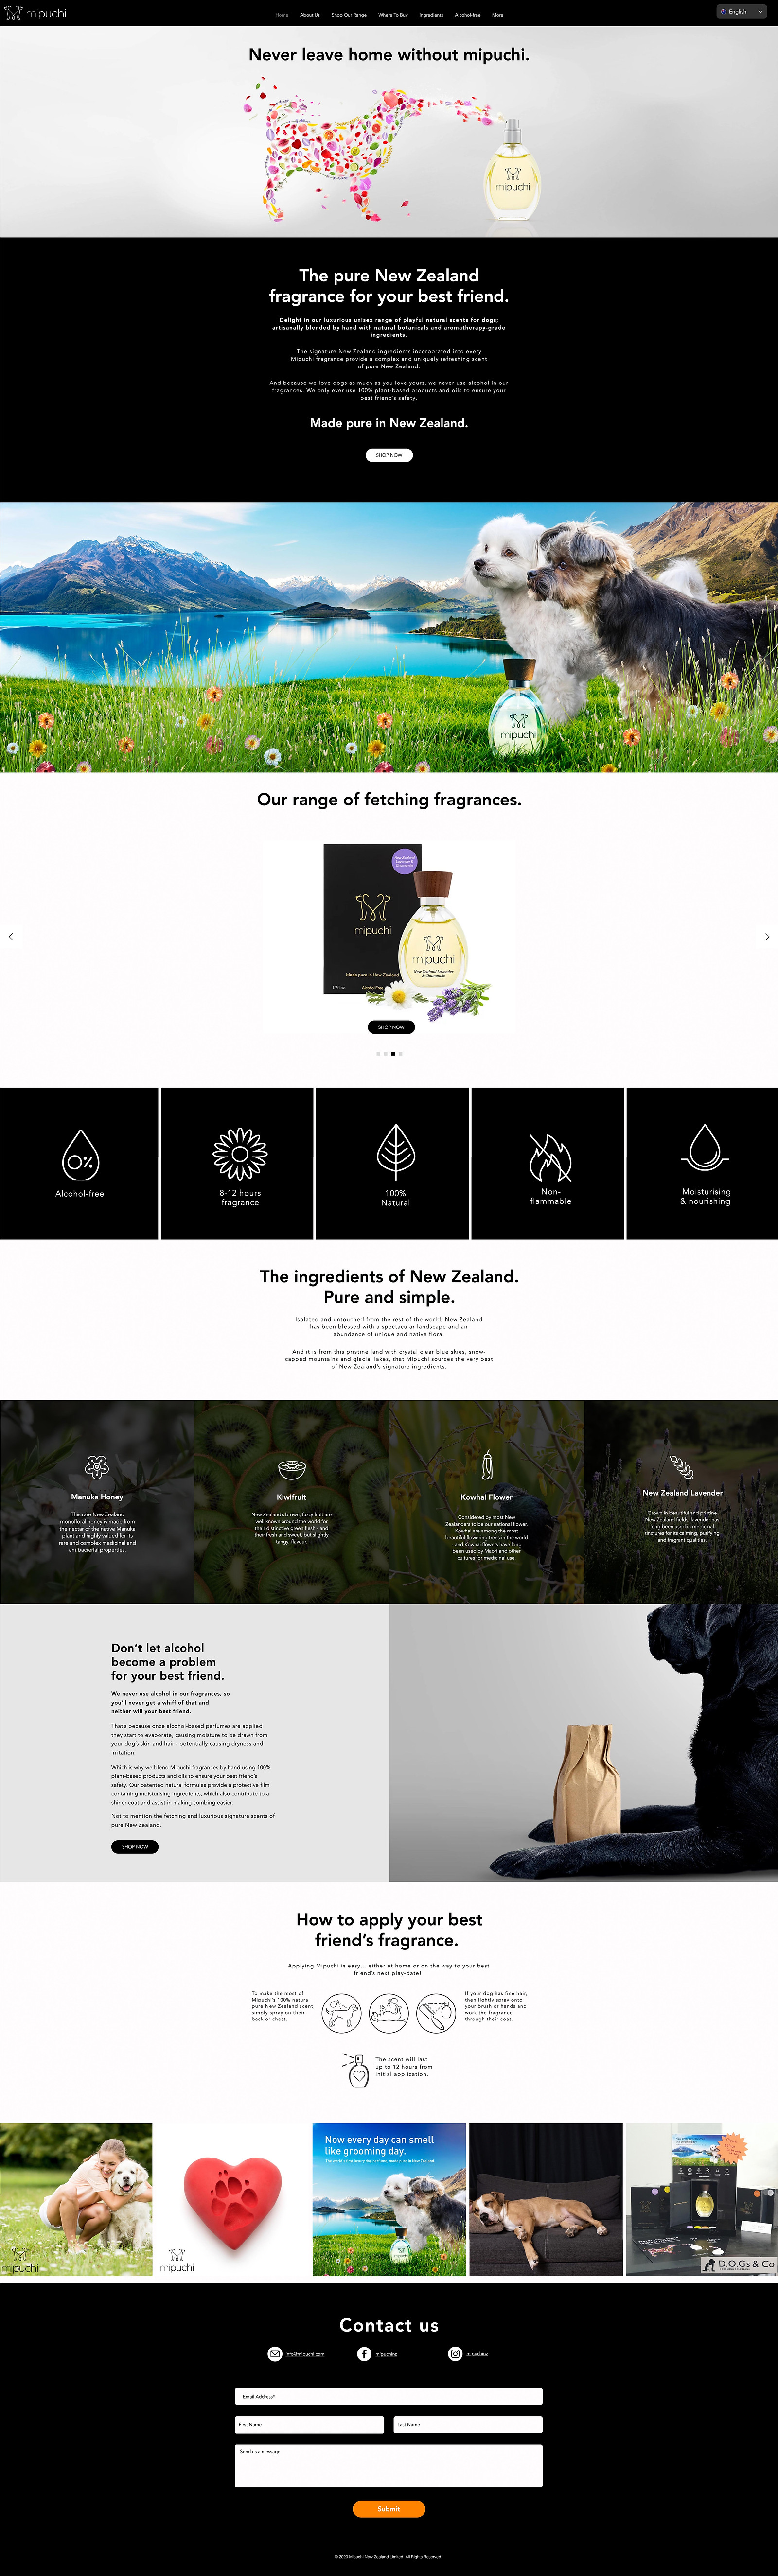 Mipuchi Homepage.jpg